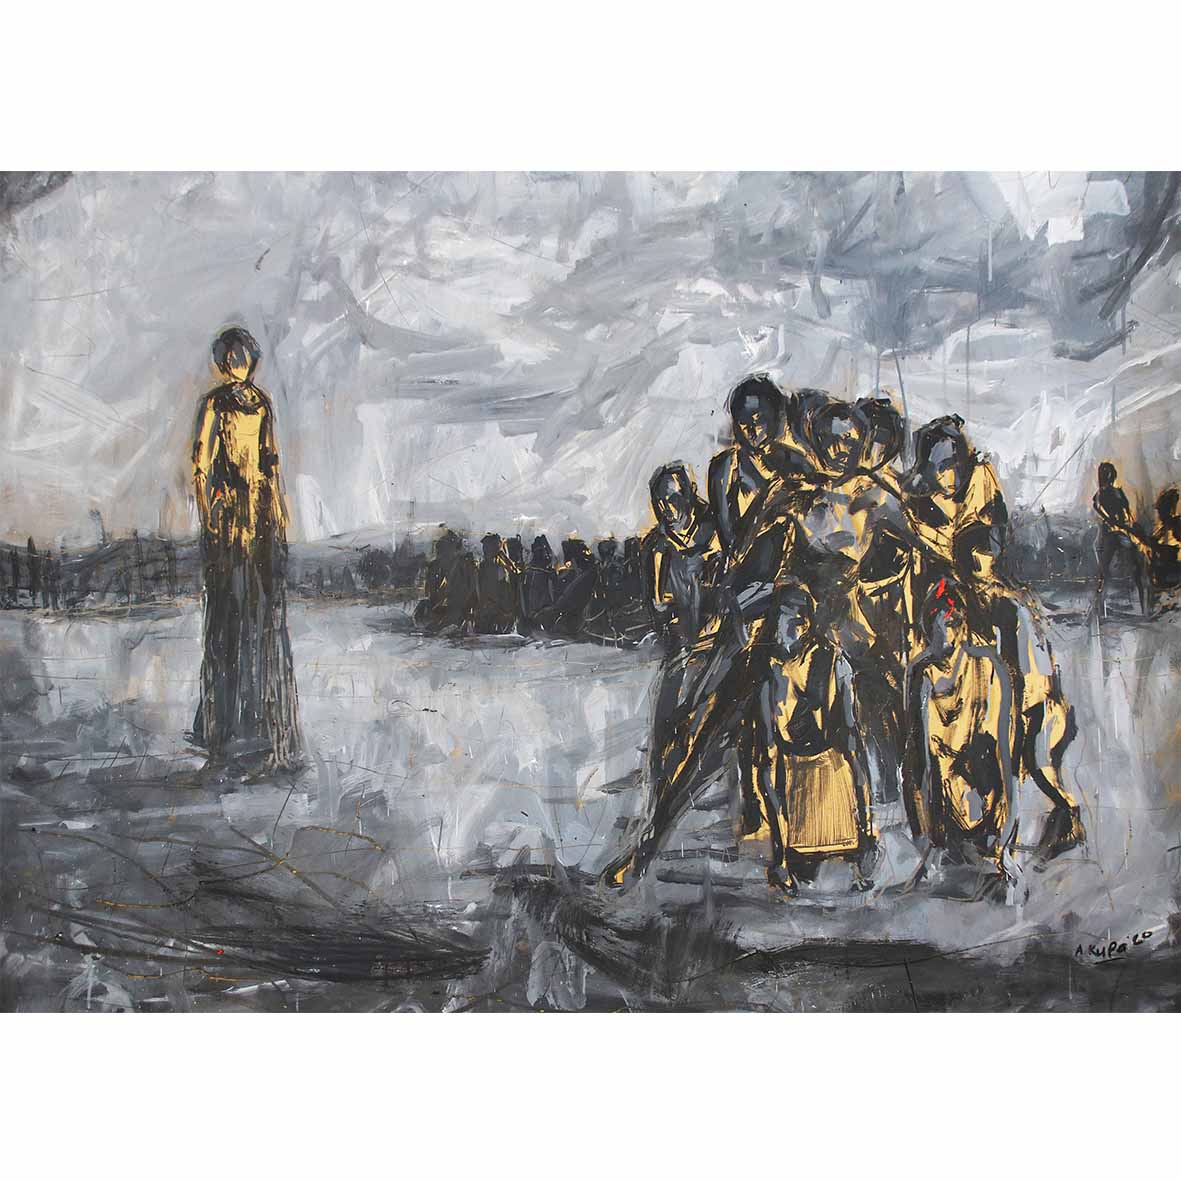 Asanda Kupa Easy said, than lived 2020 Oil on paper 90 x 140 cm